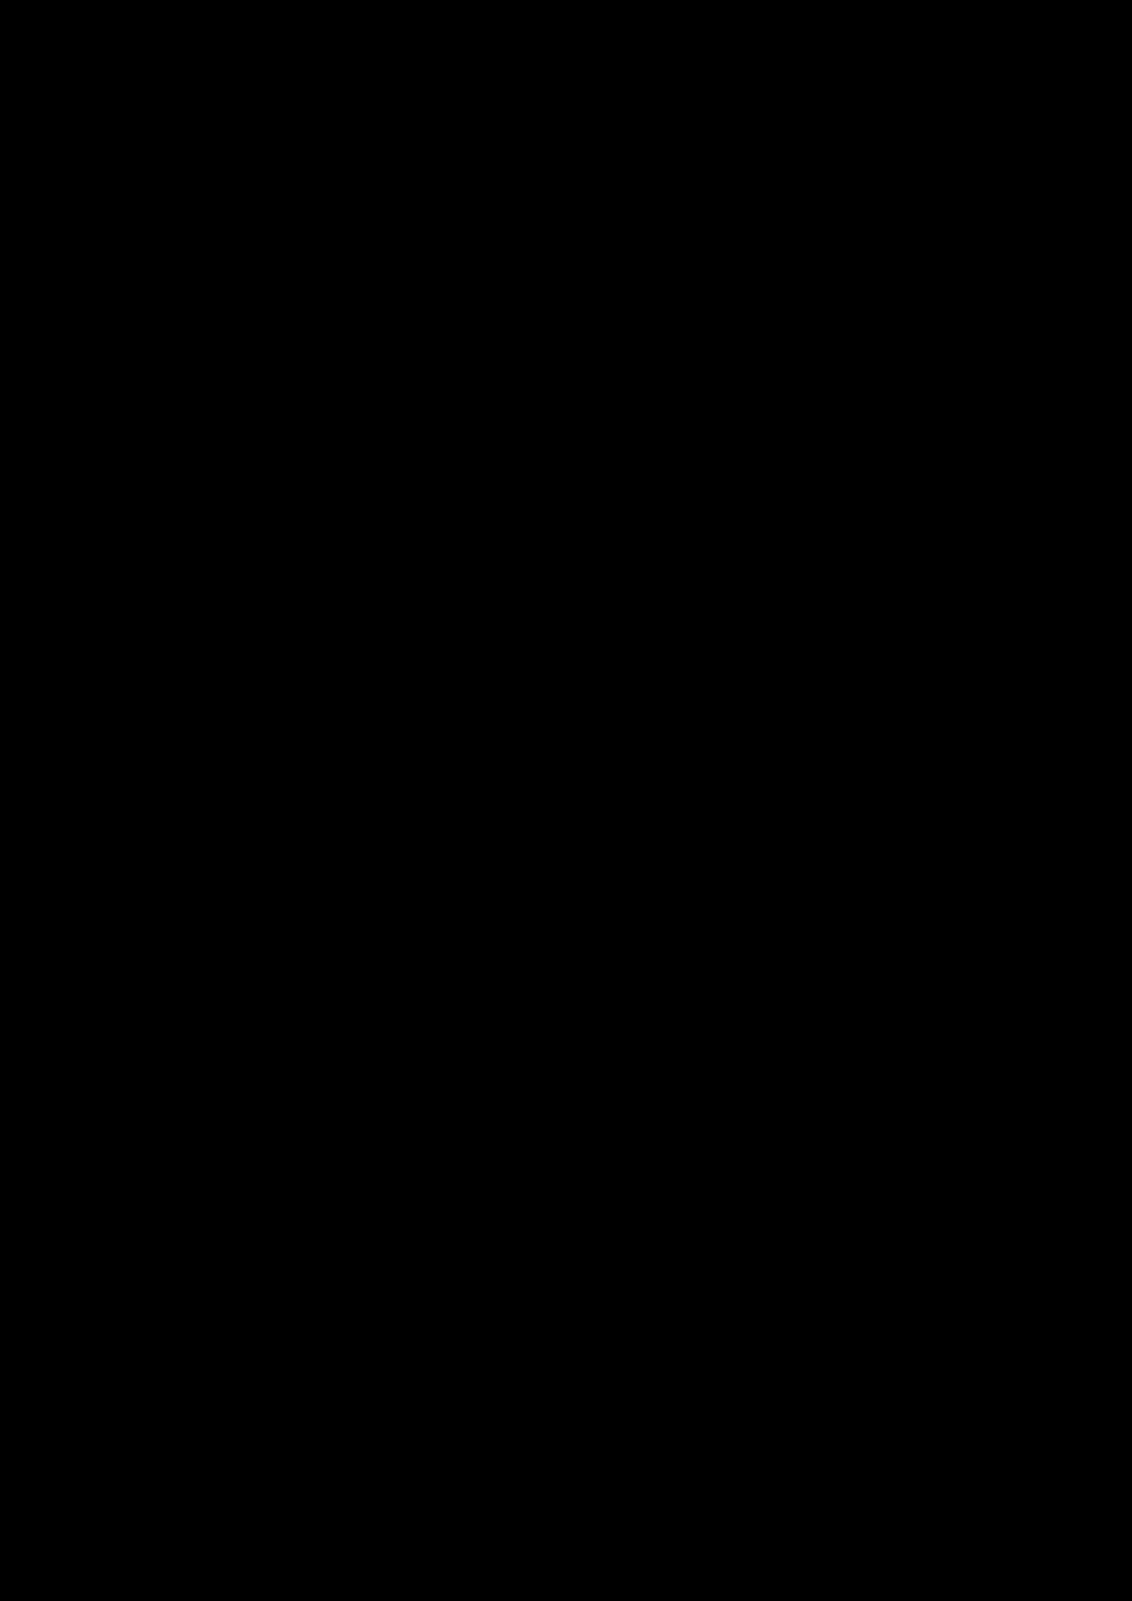 Ot Bolshogo Uma slide, Image 16